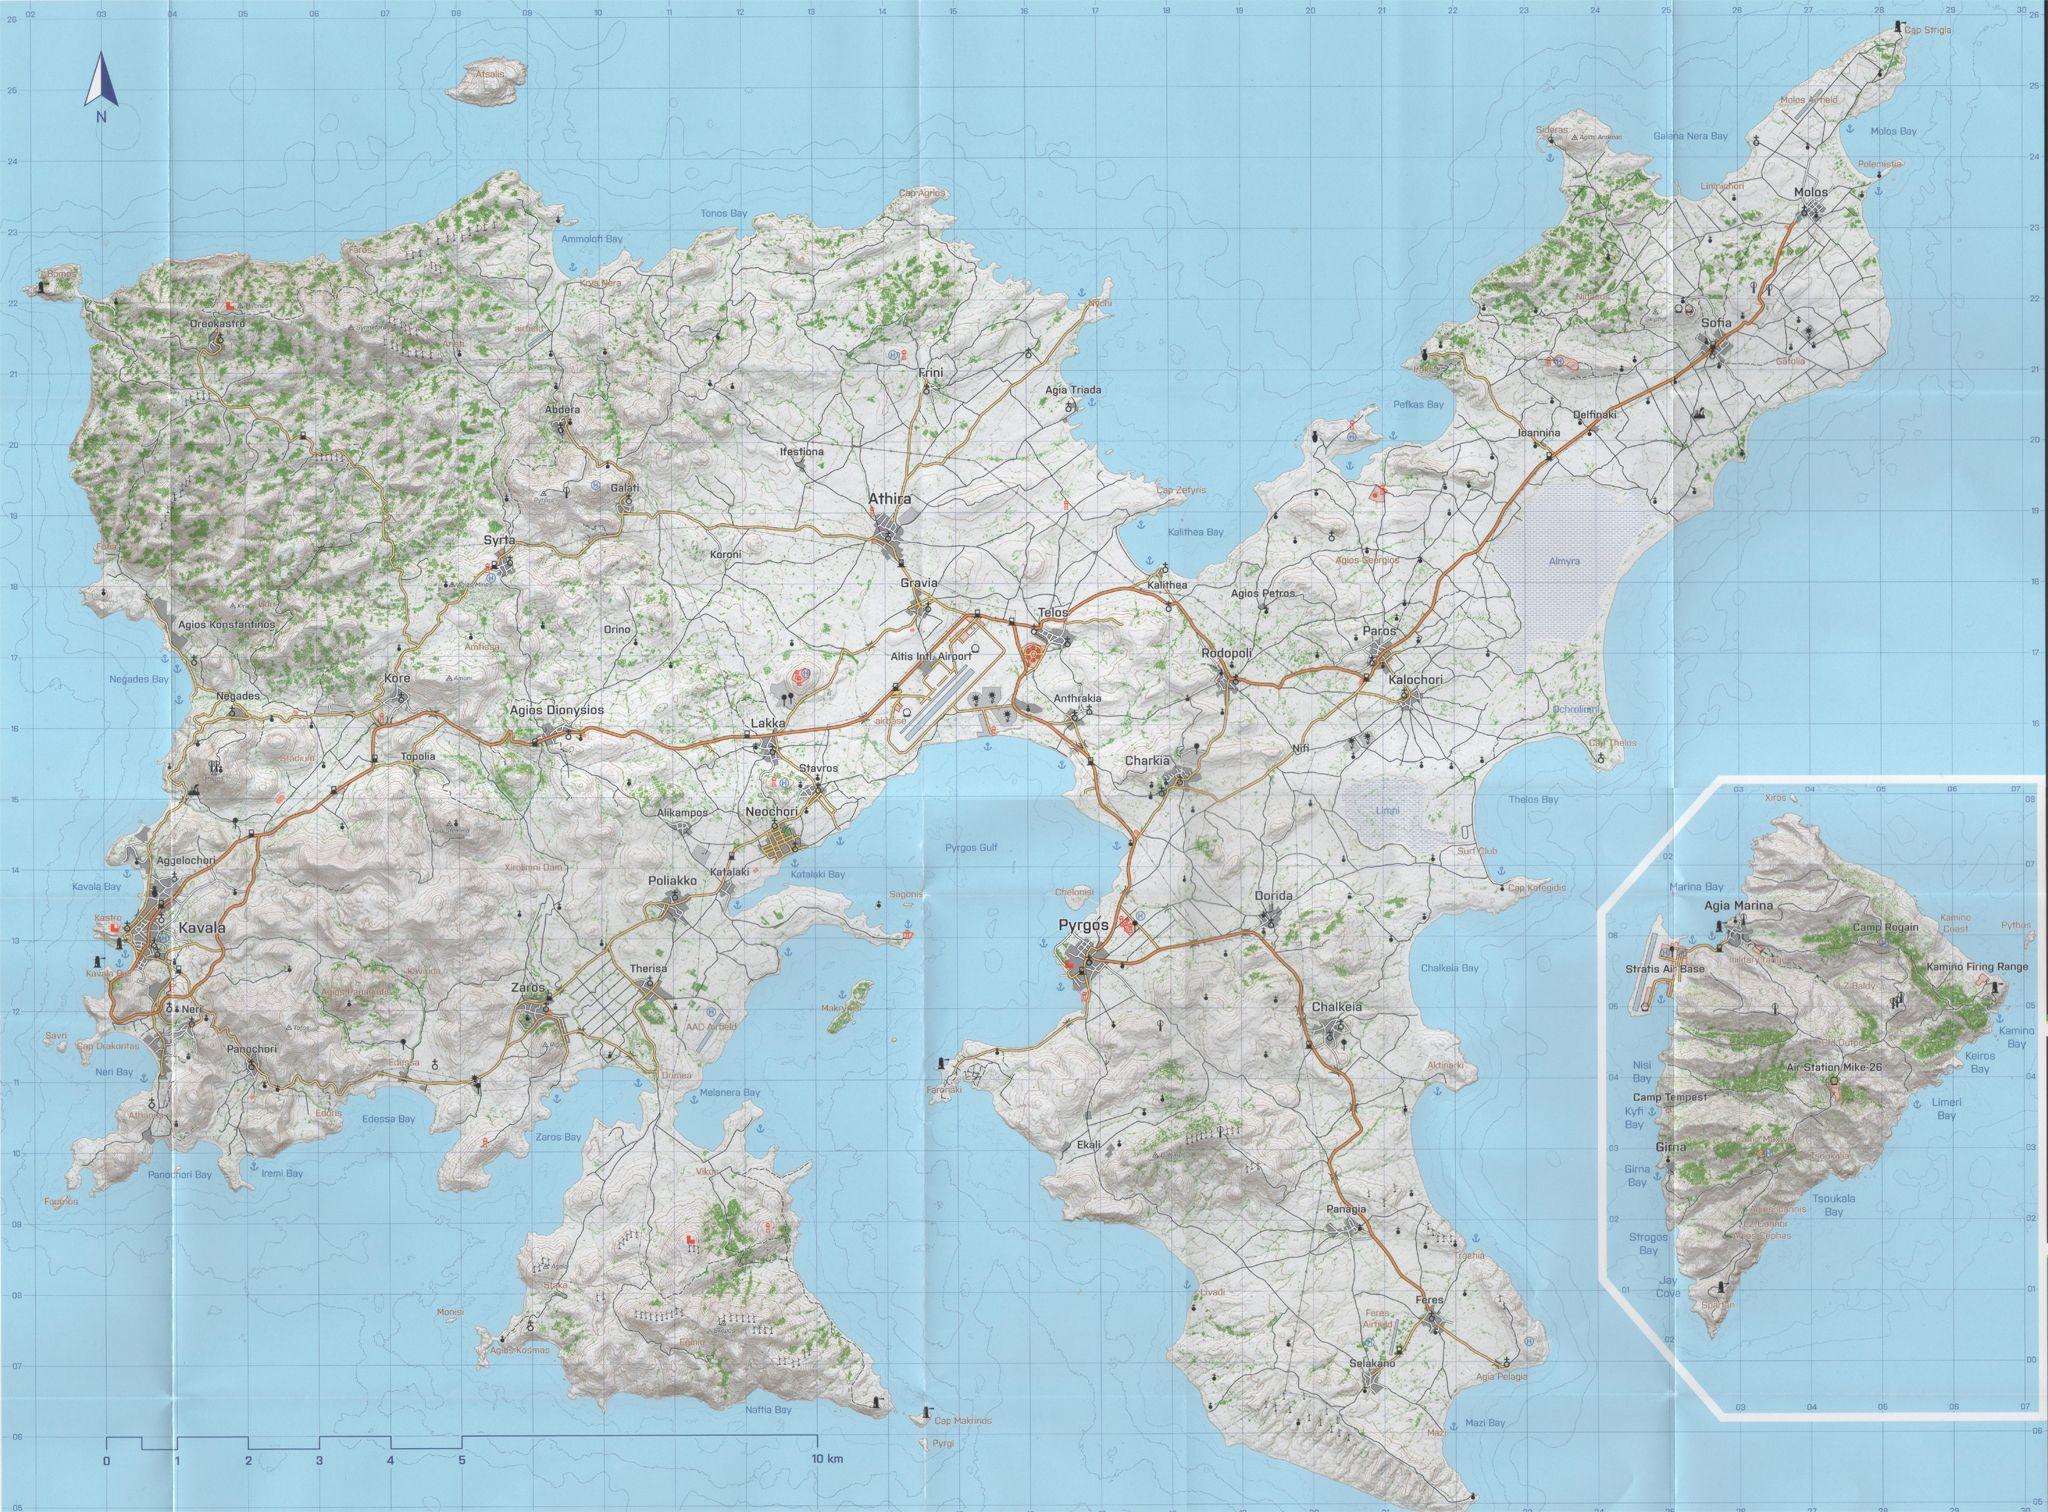 Arma 3 Map | Games And joy | Arma 3, Map, Diagram